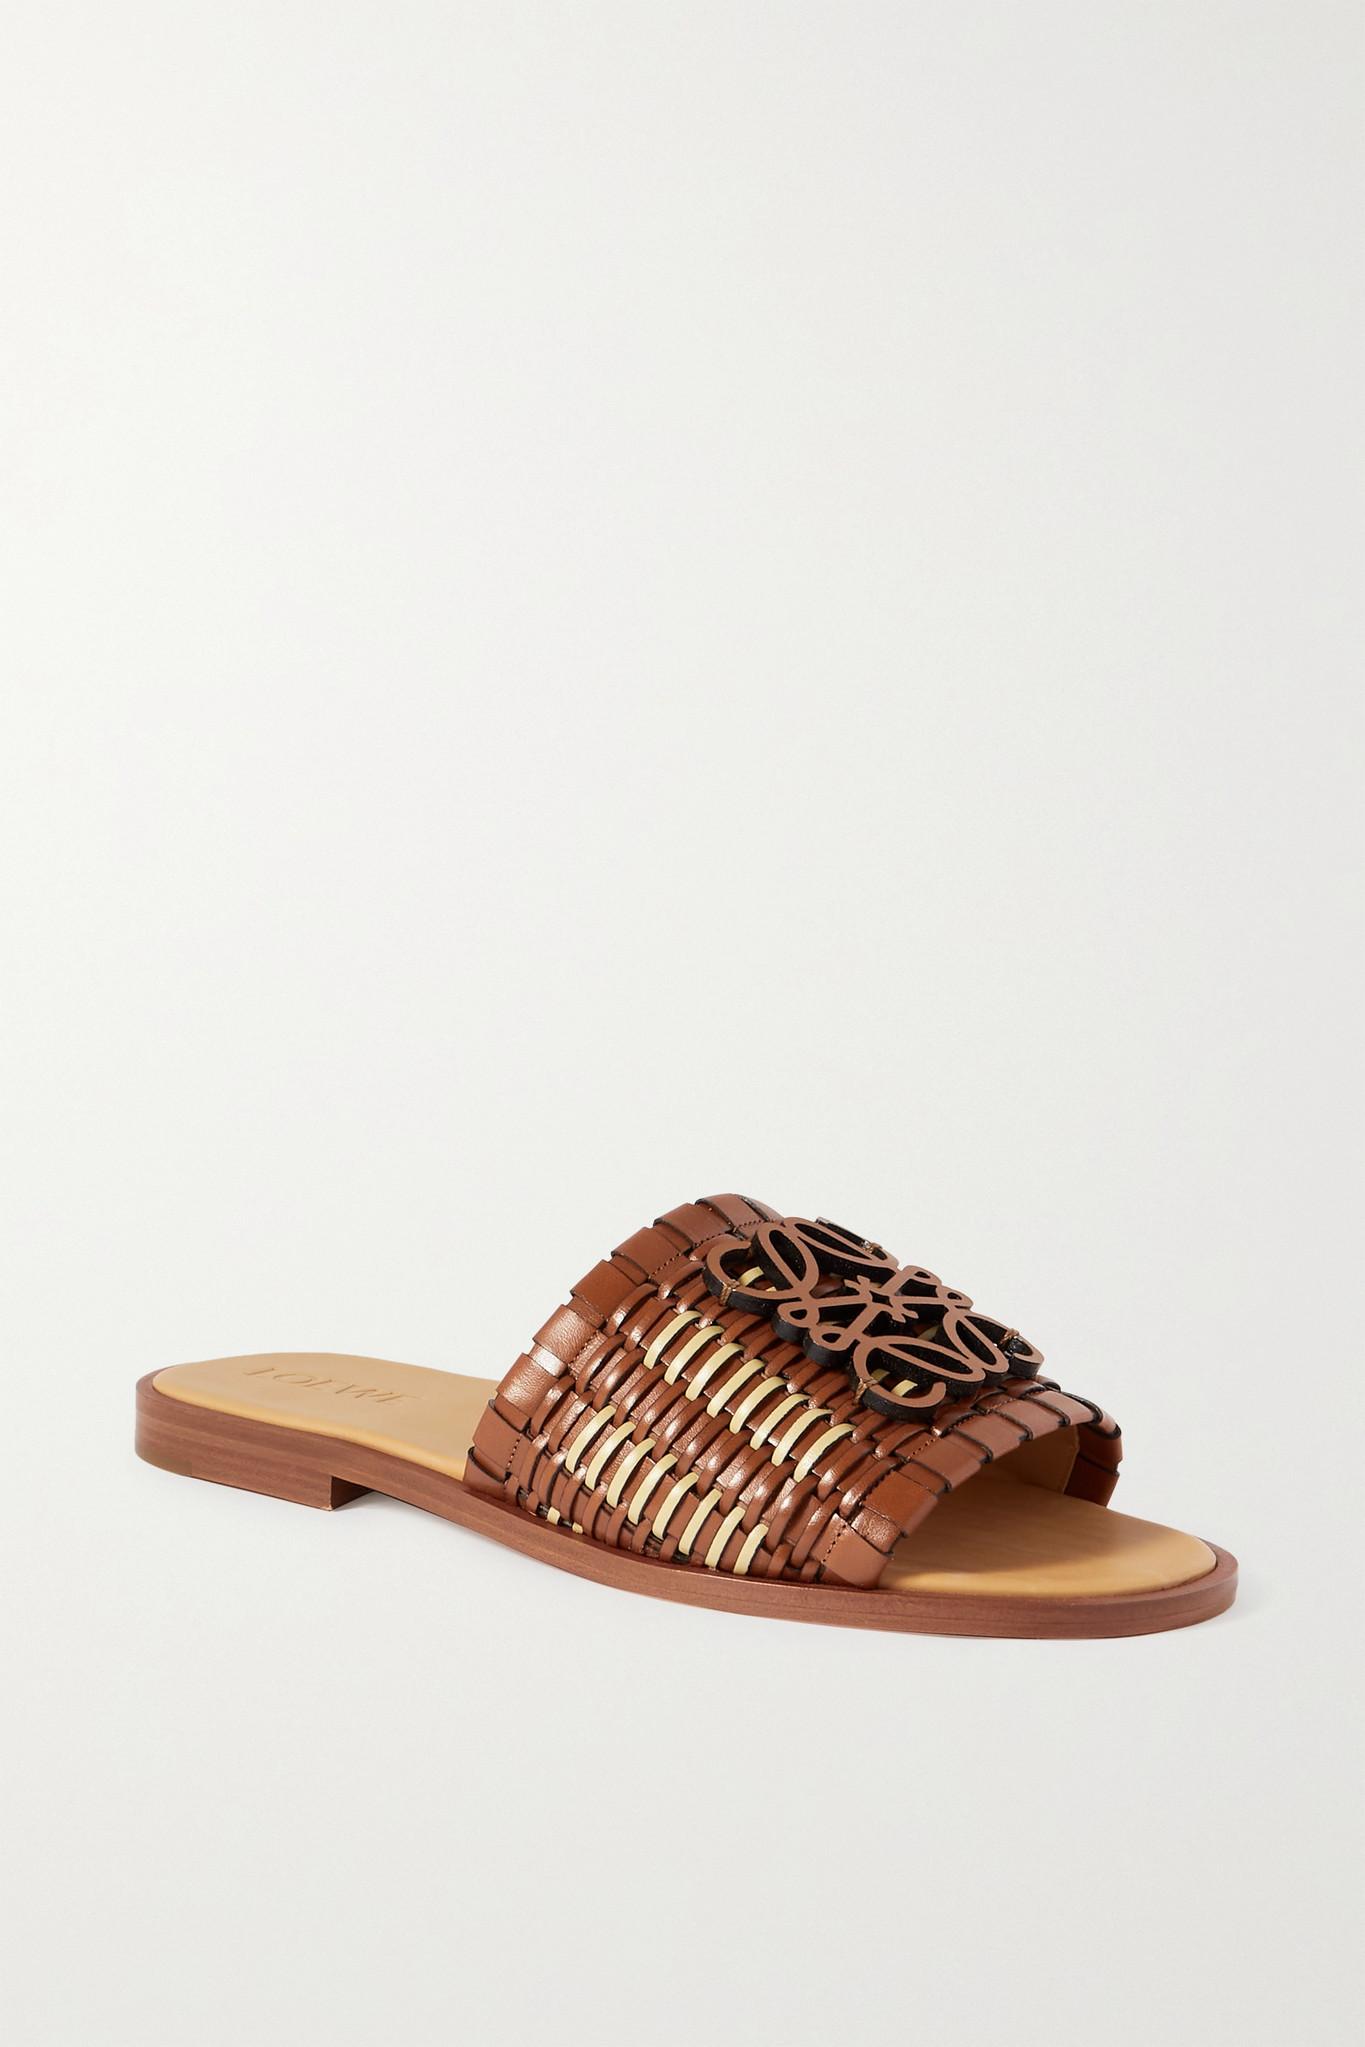 LOEWE - Anagram Woven Leather Slides - Brown - IT41